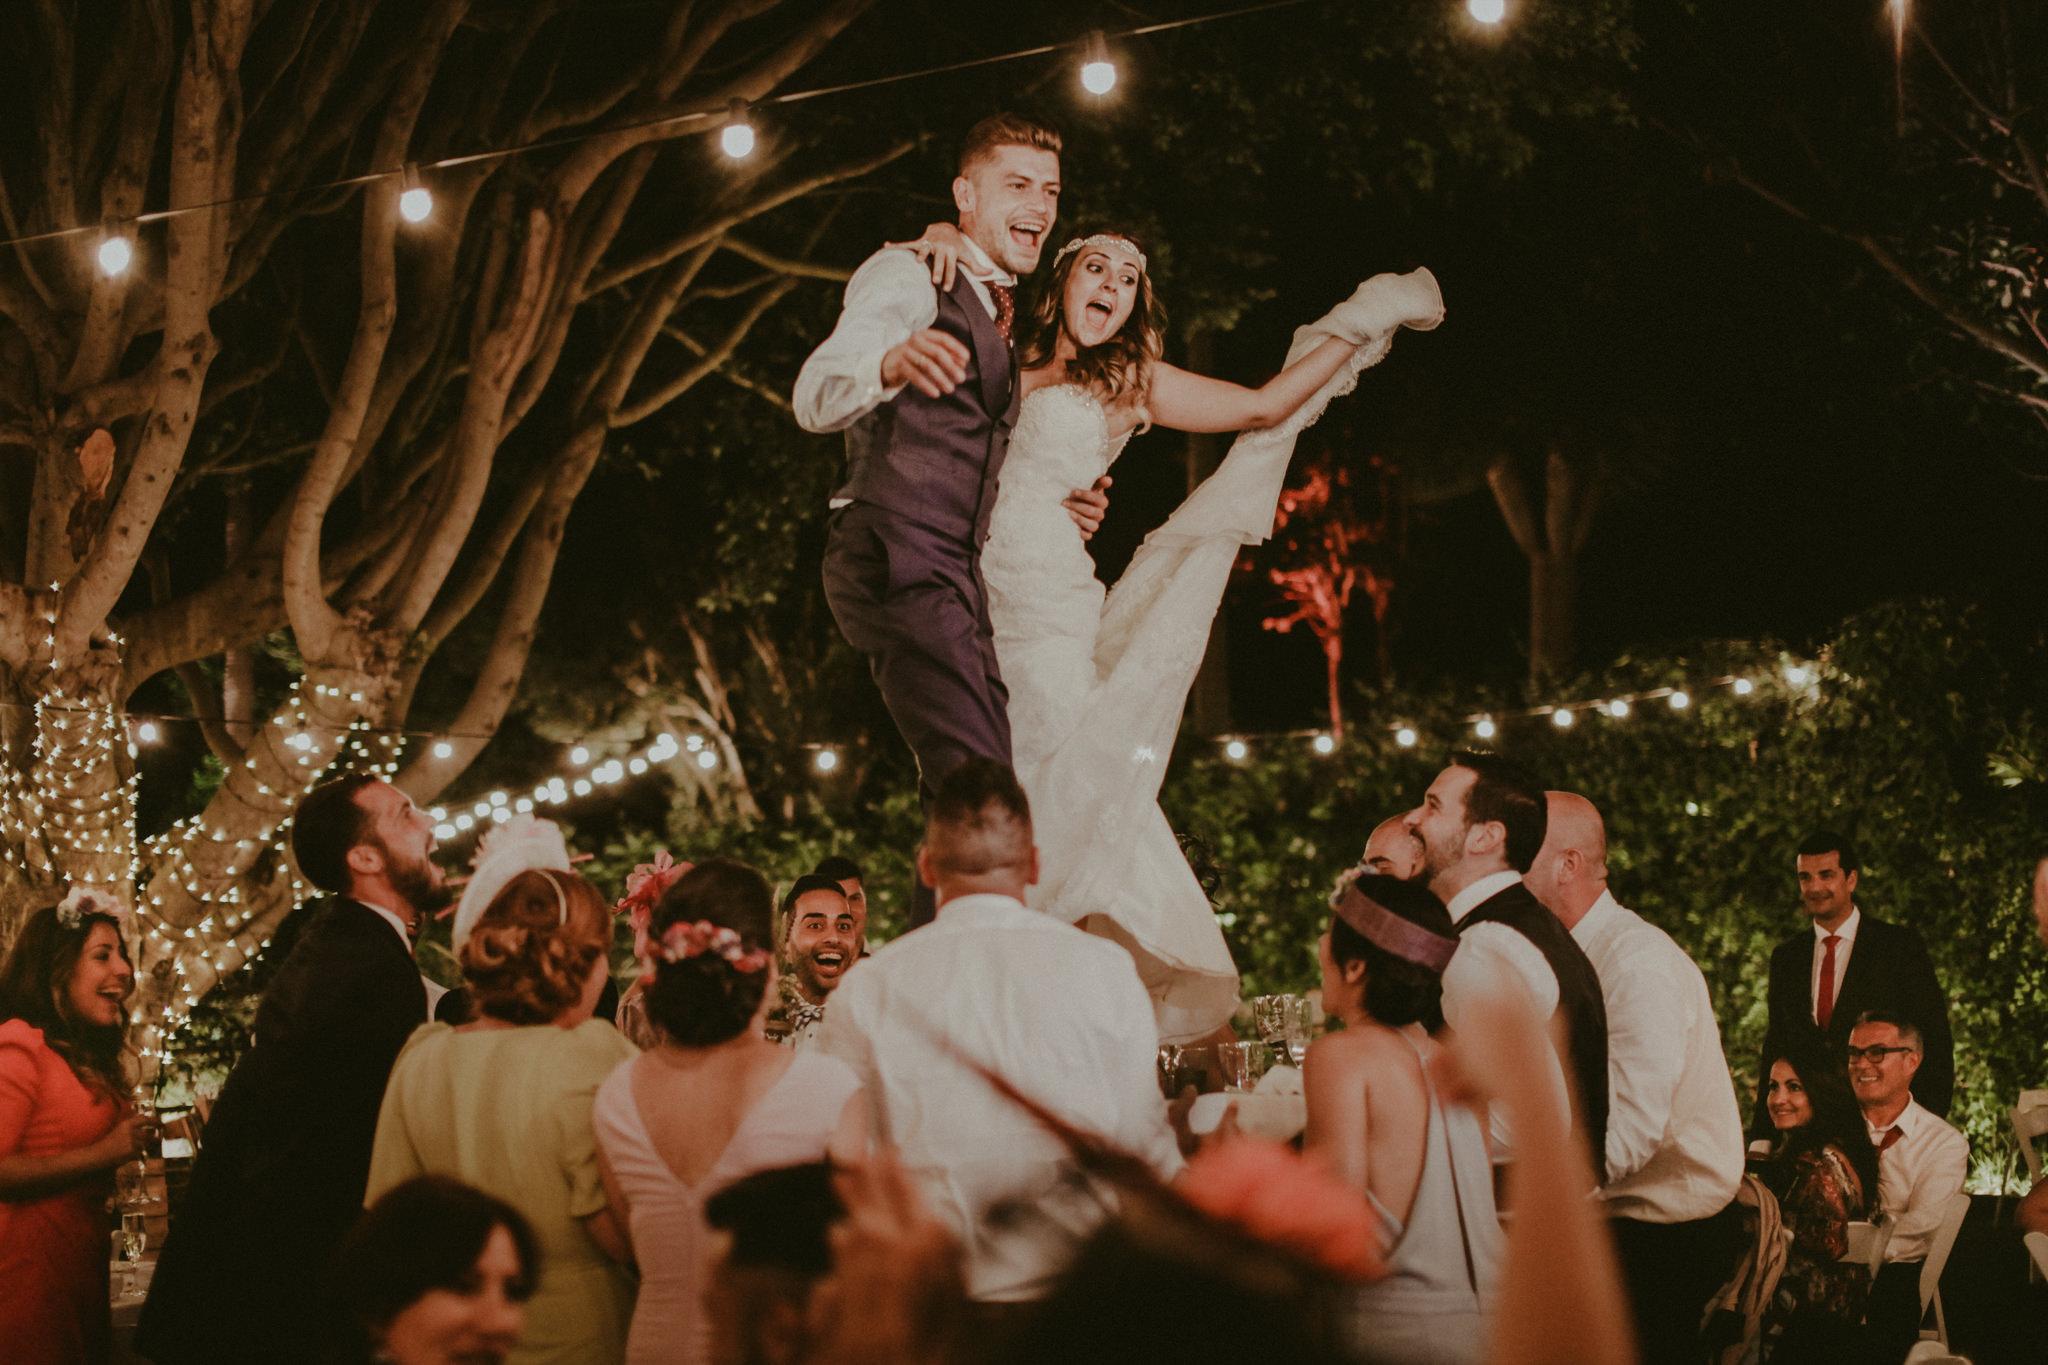 boda-diferente-fotografo-boda-laspalmas-grancanaria-85